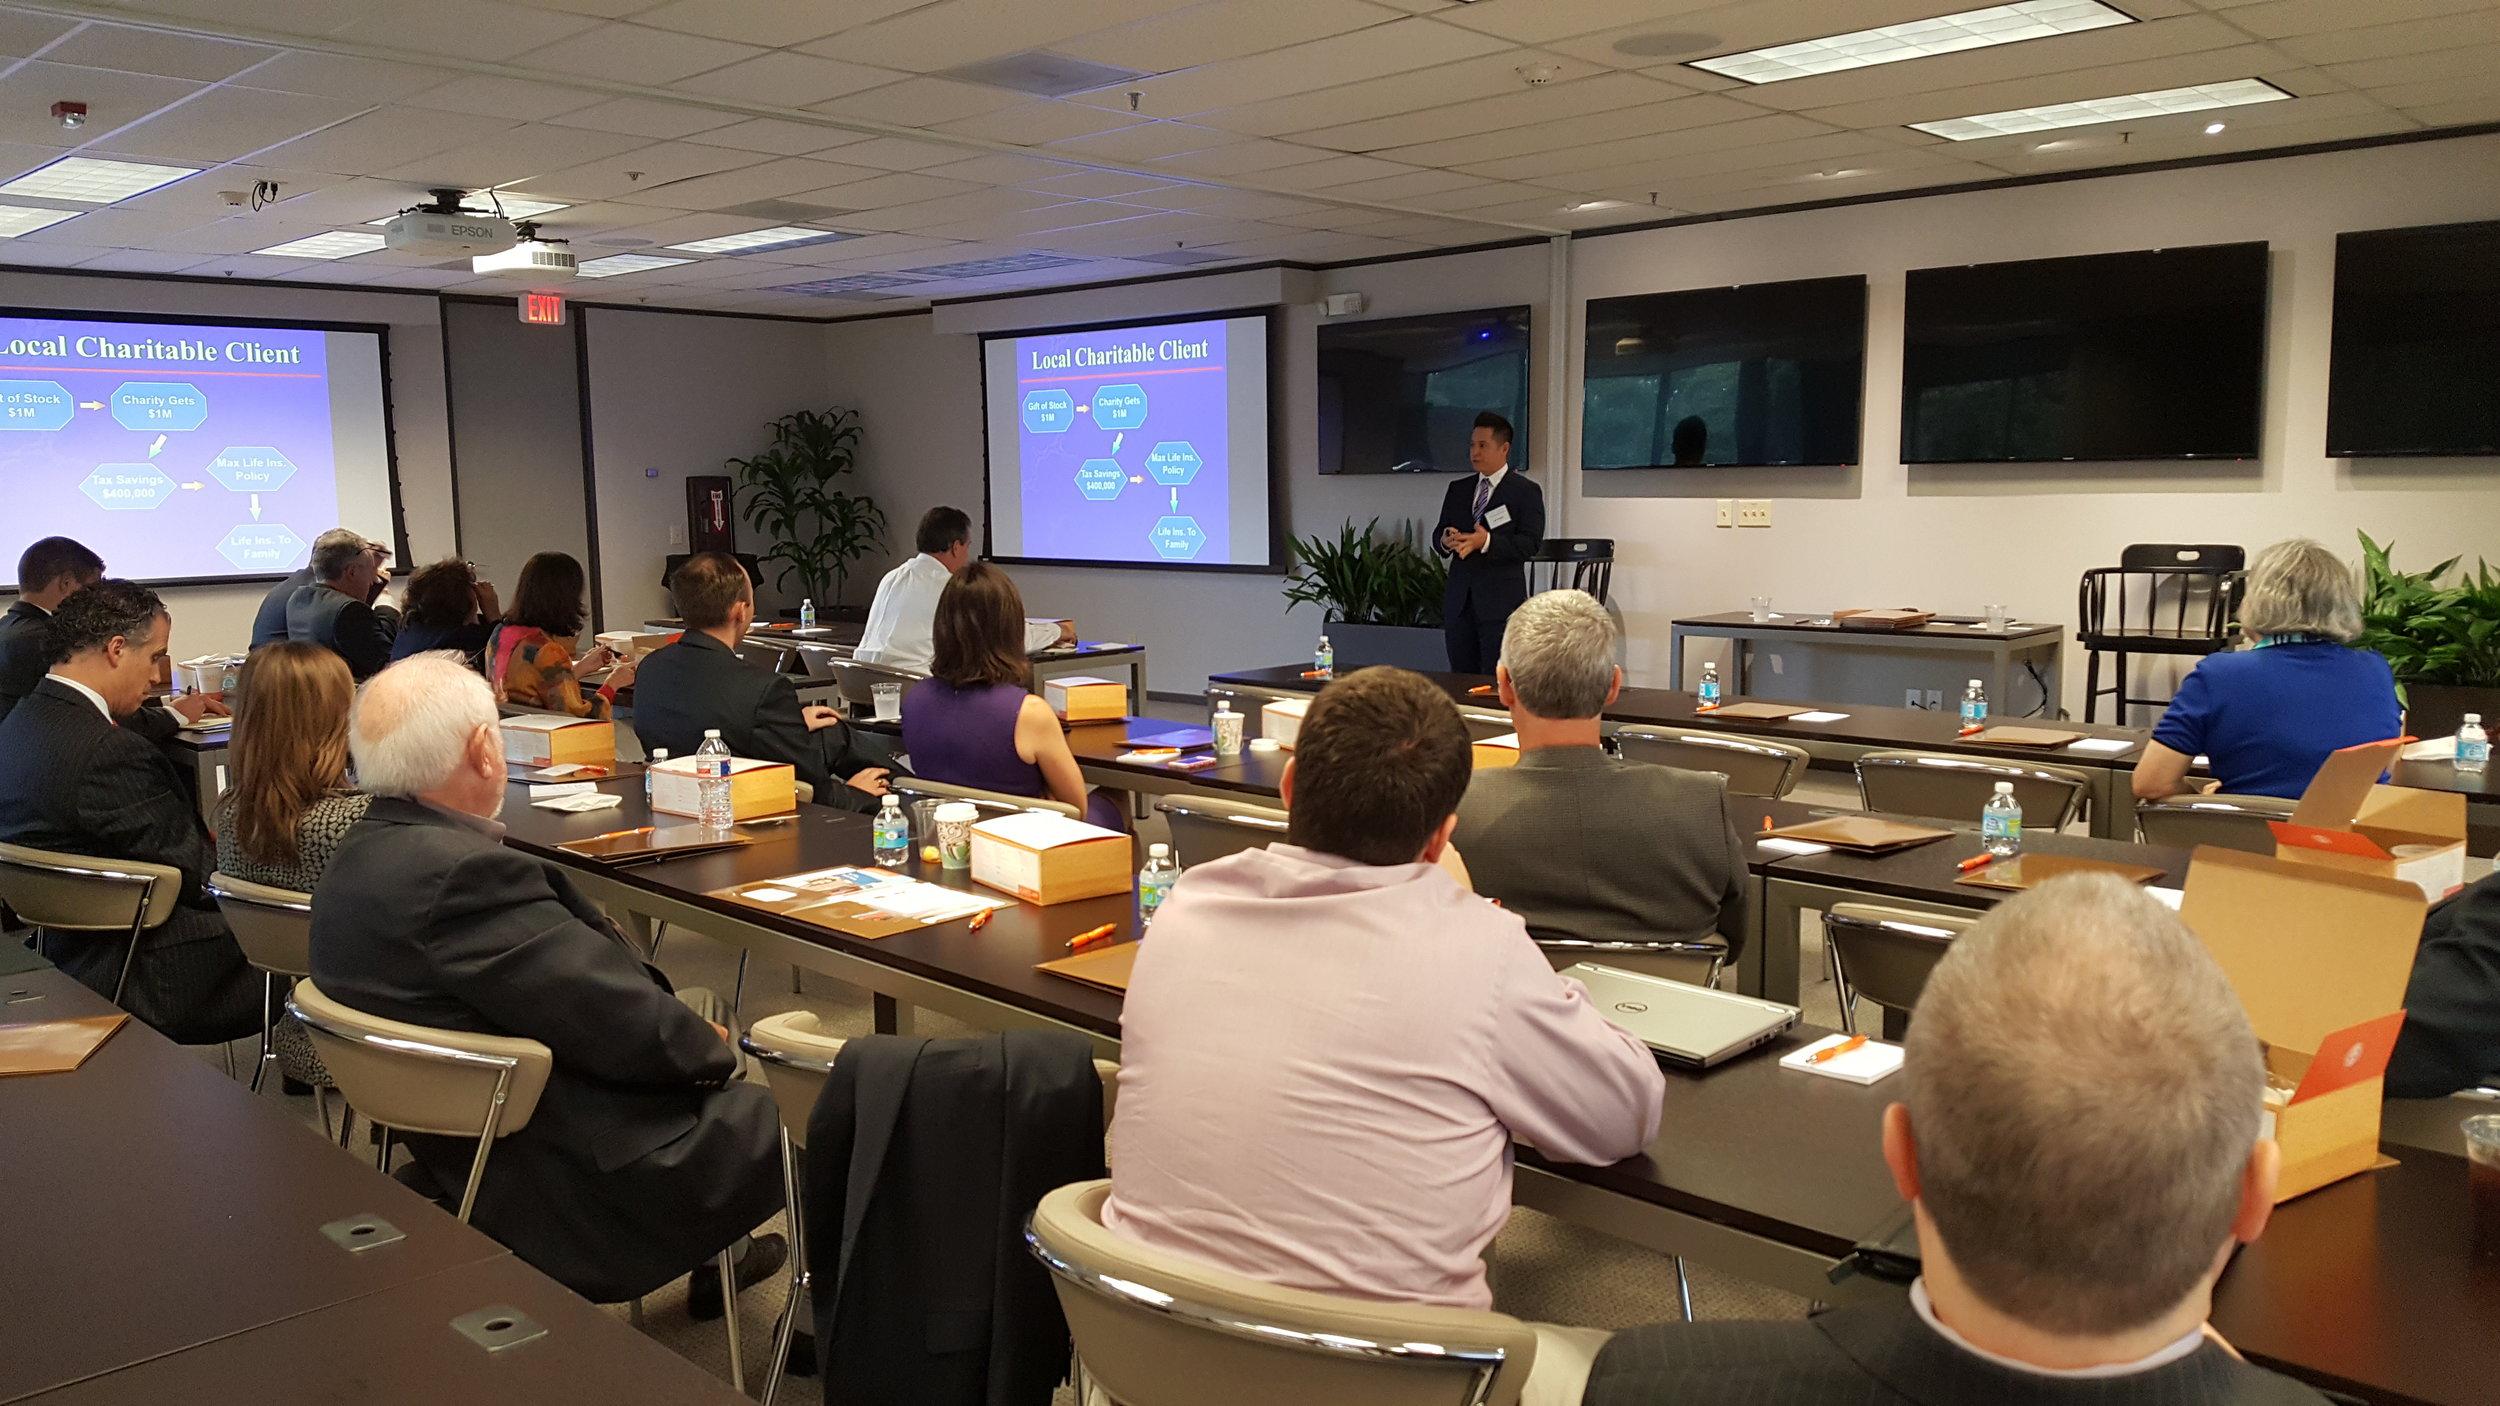 Customized Continuing Education Seminar for over 30 professional advisors. University of Texas Health, San Antonio, Texas.